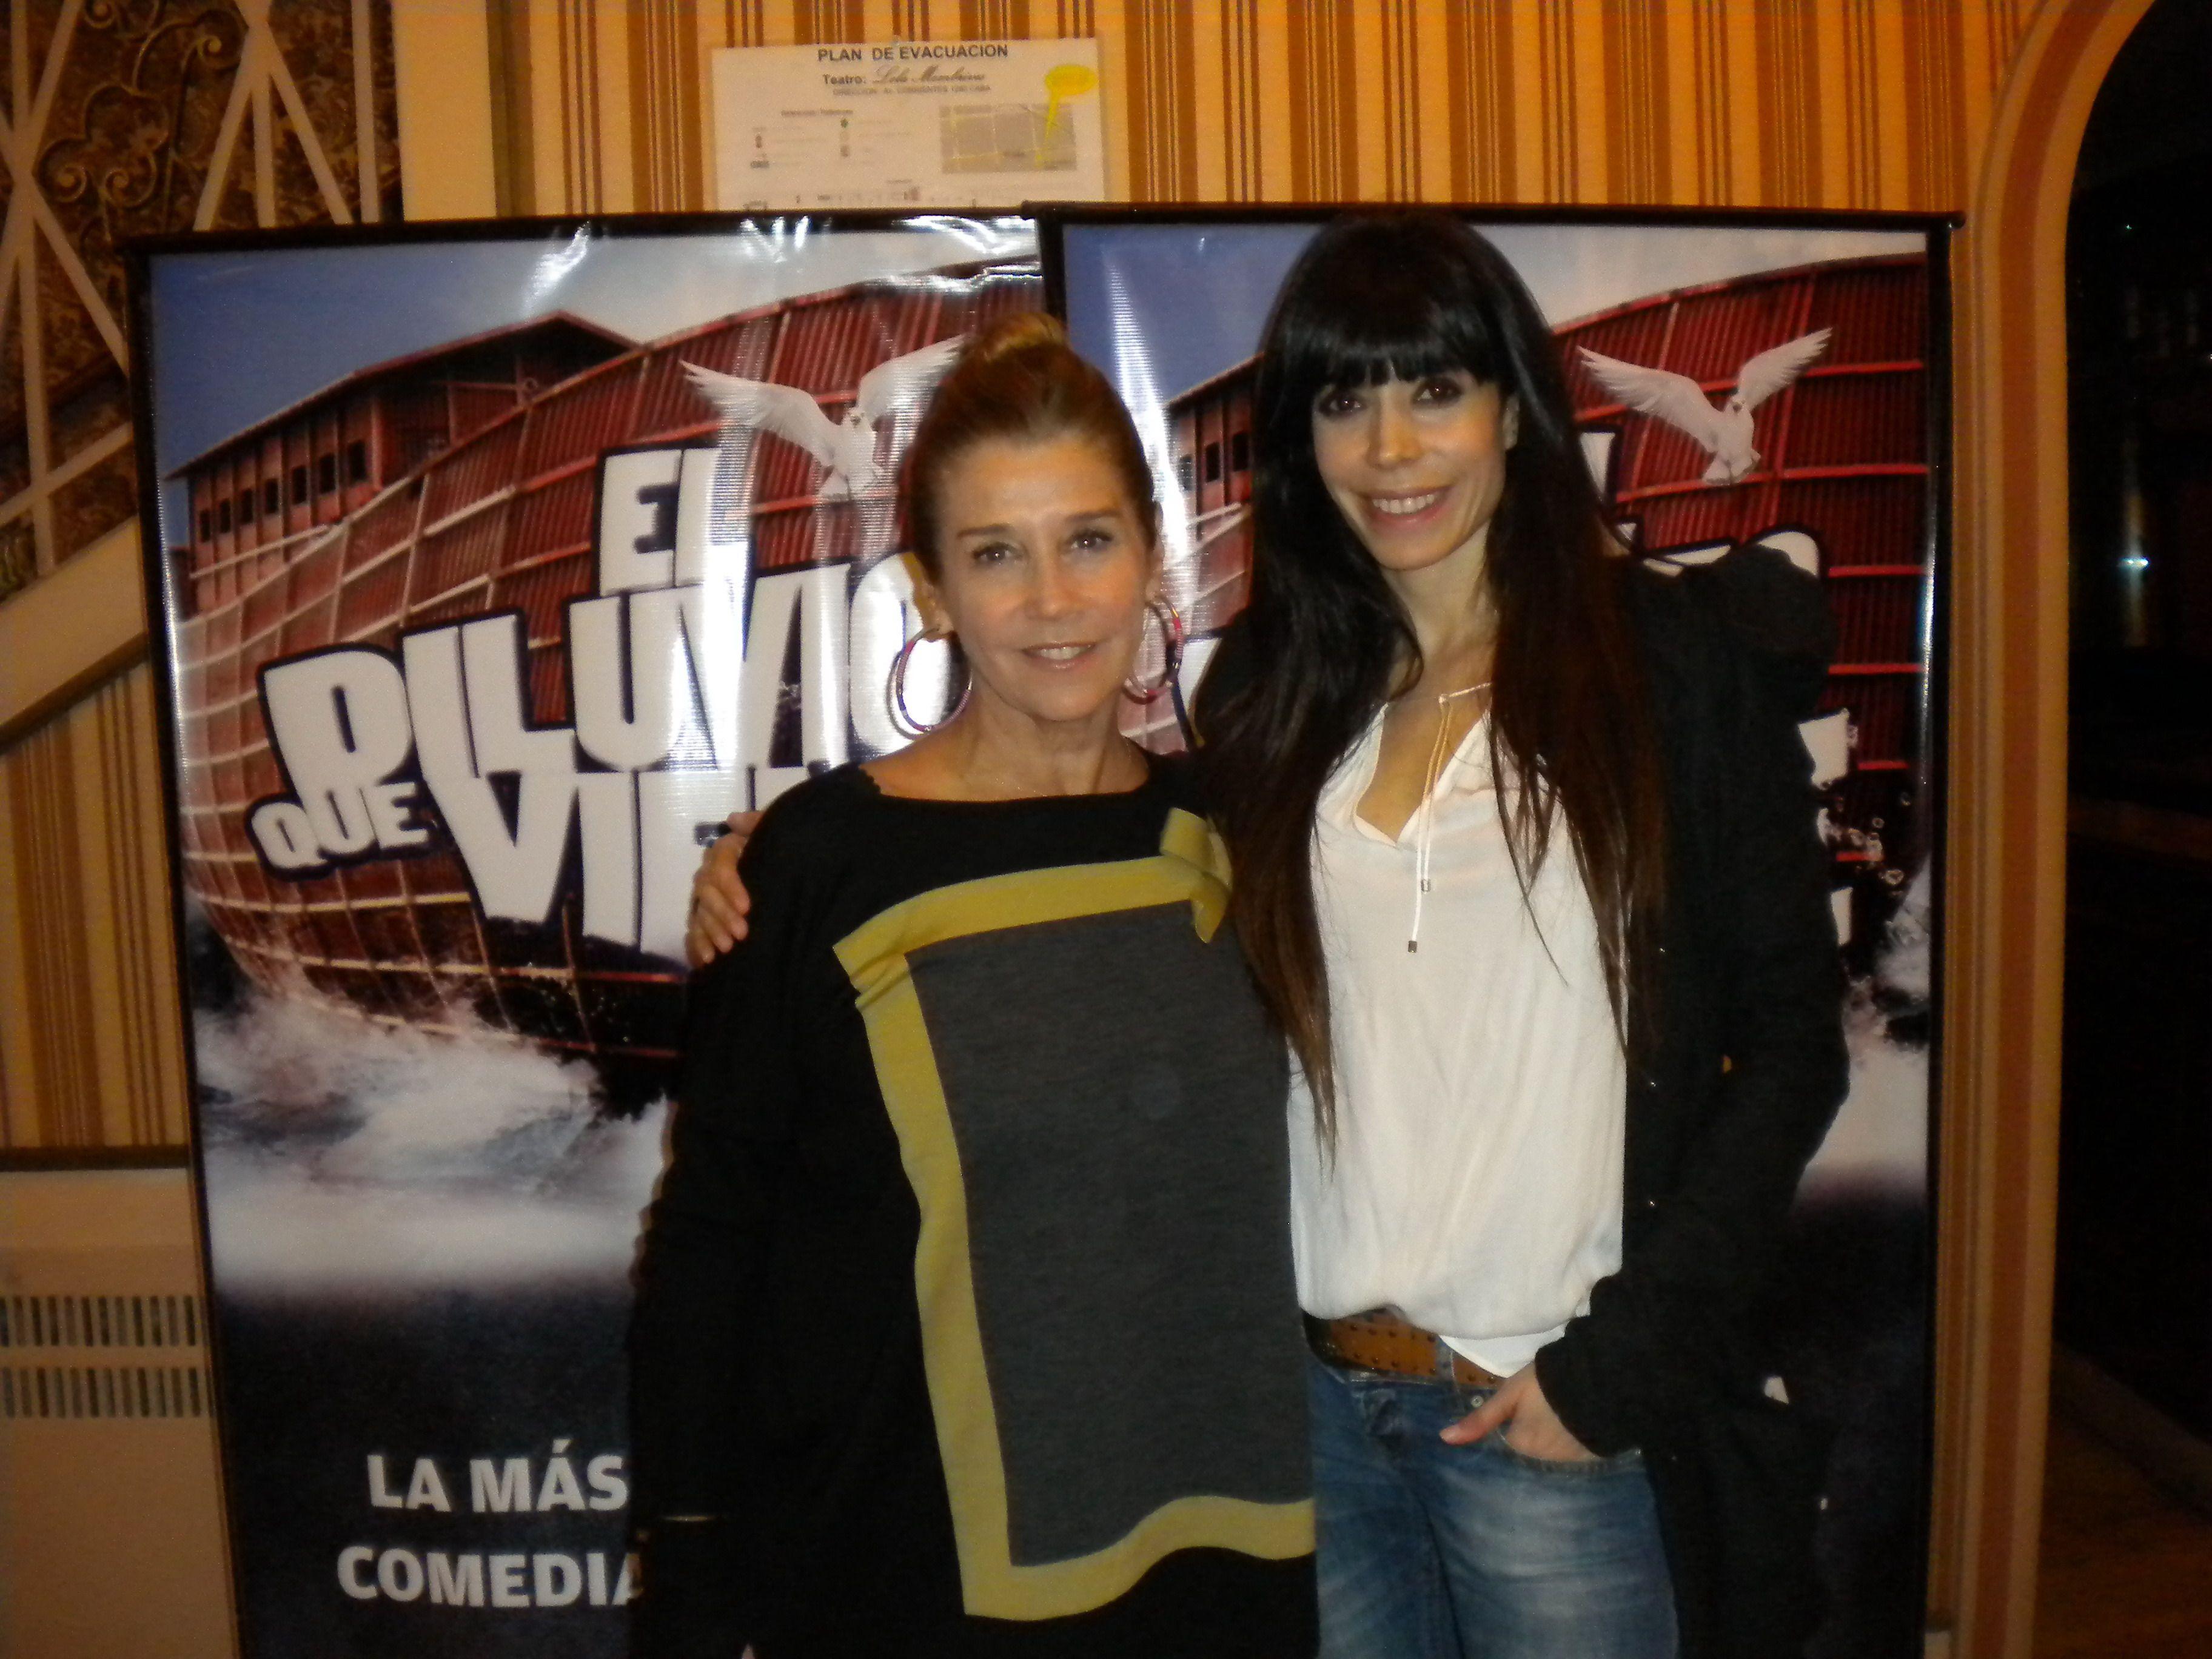 Famosos al teatro: Marcela Tinayre con Fidalgo; Iñaki Urlezaga fue a ver a Bossi